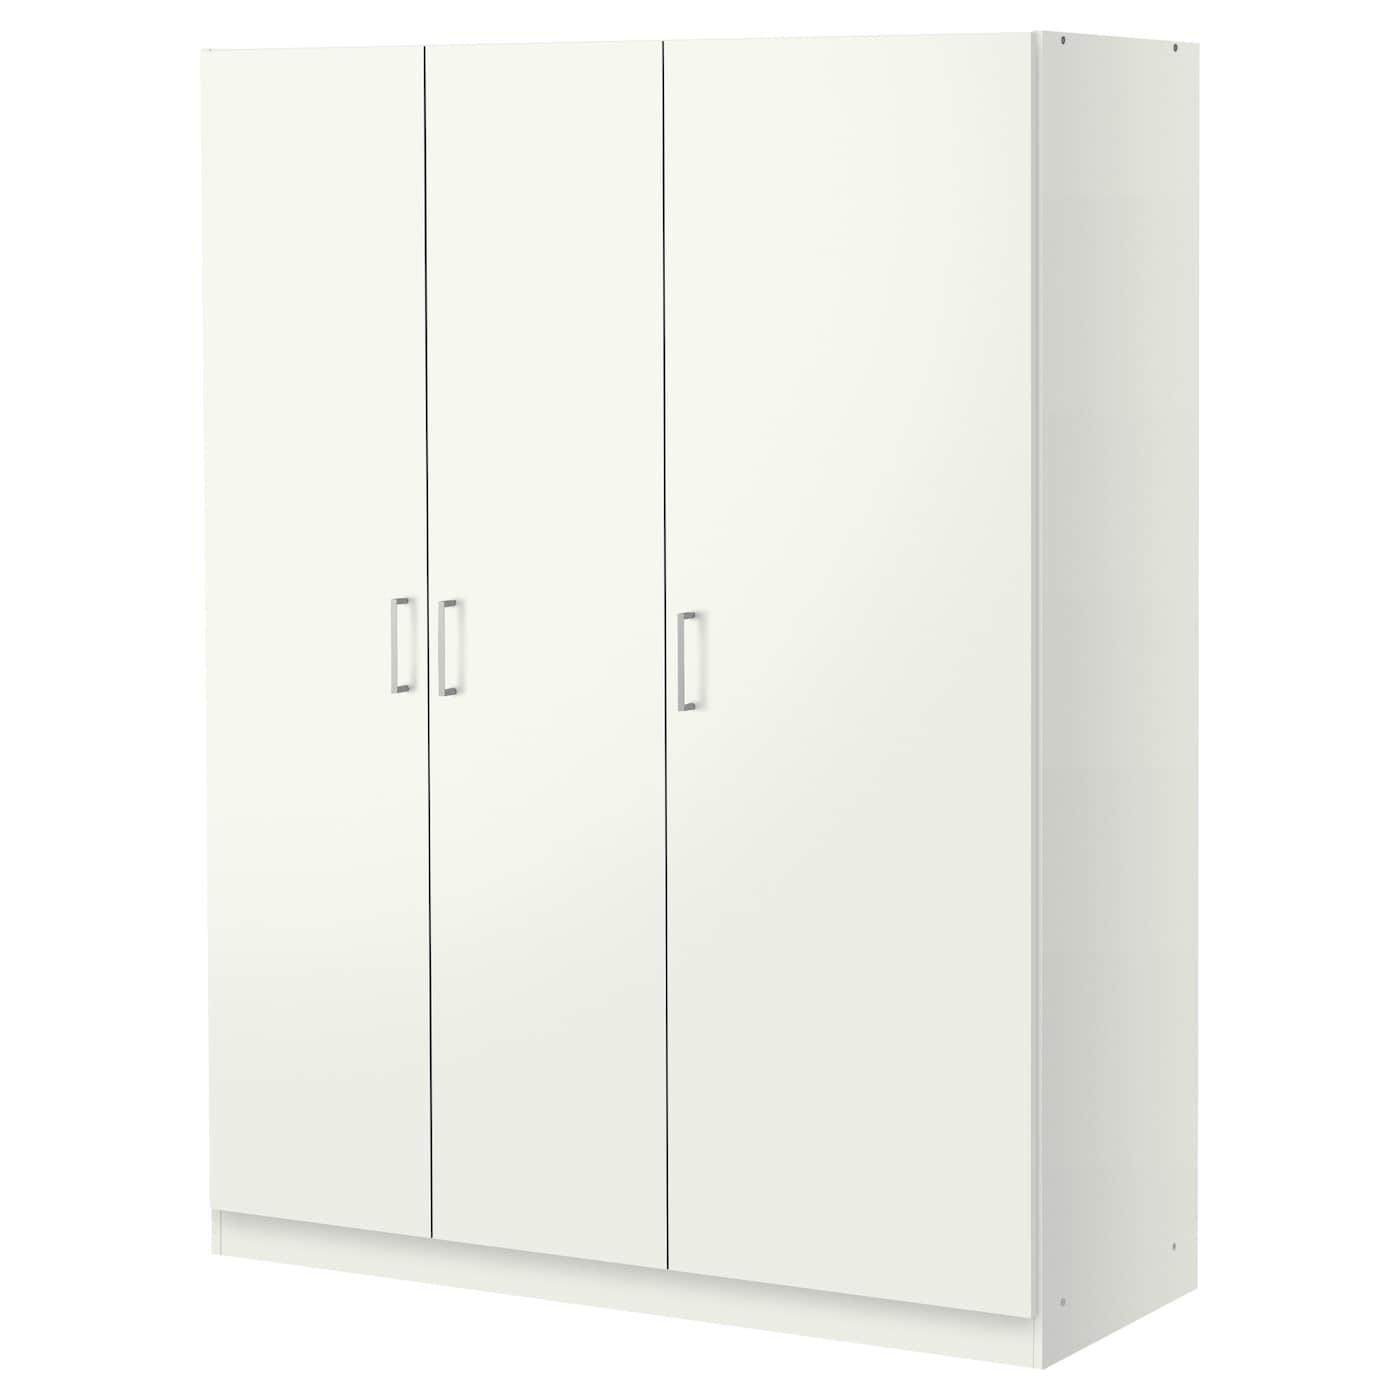 kvikne wardrobe with 2 sliding doors white 120x190 cm ikea. Black Bedroom Furniture Sets. Home Design Ideas